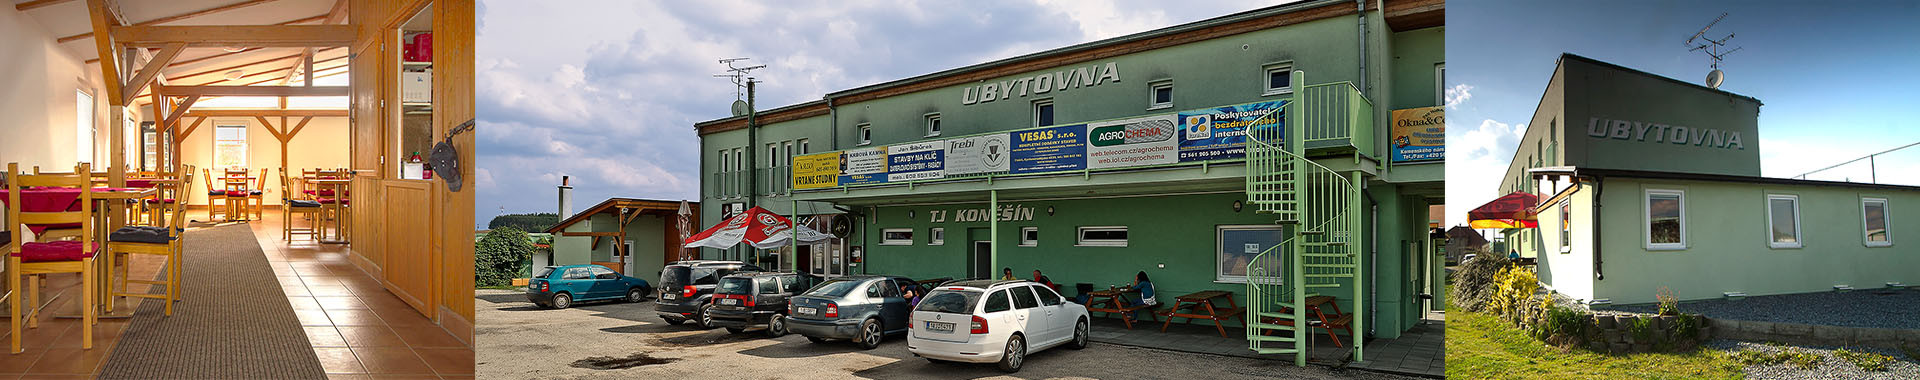 http://www.ubytovnakonesin.cz/wp-content/uploads/2014/08/Slide_1-ubytovna-1920x380.jpg